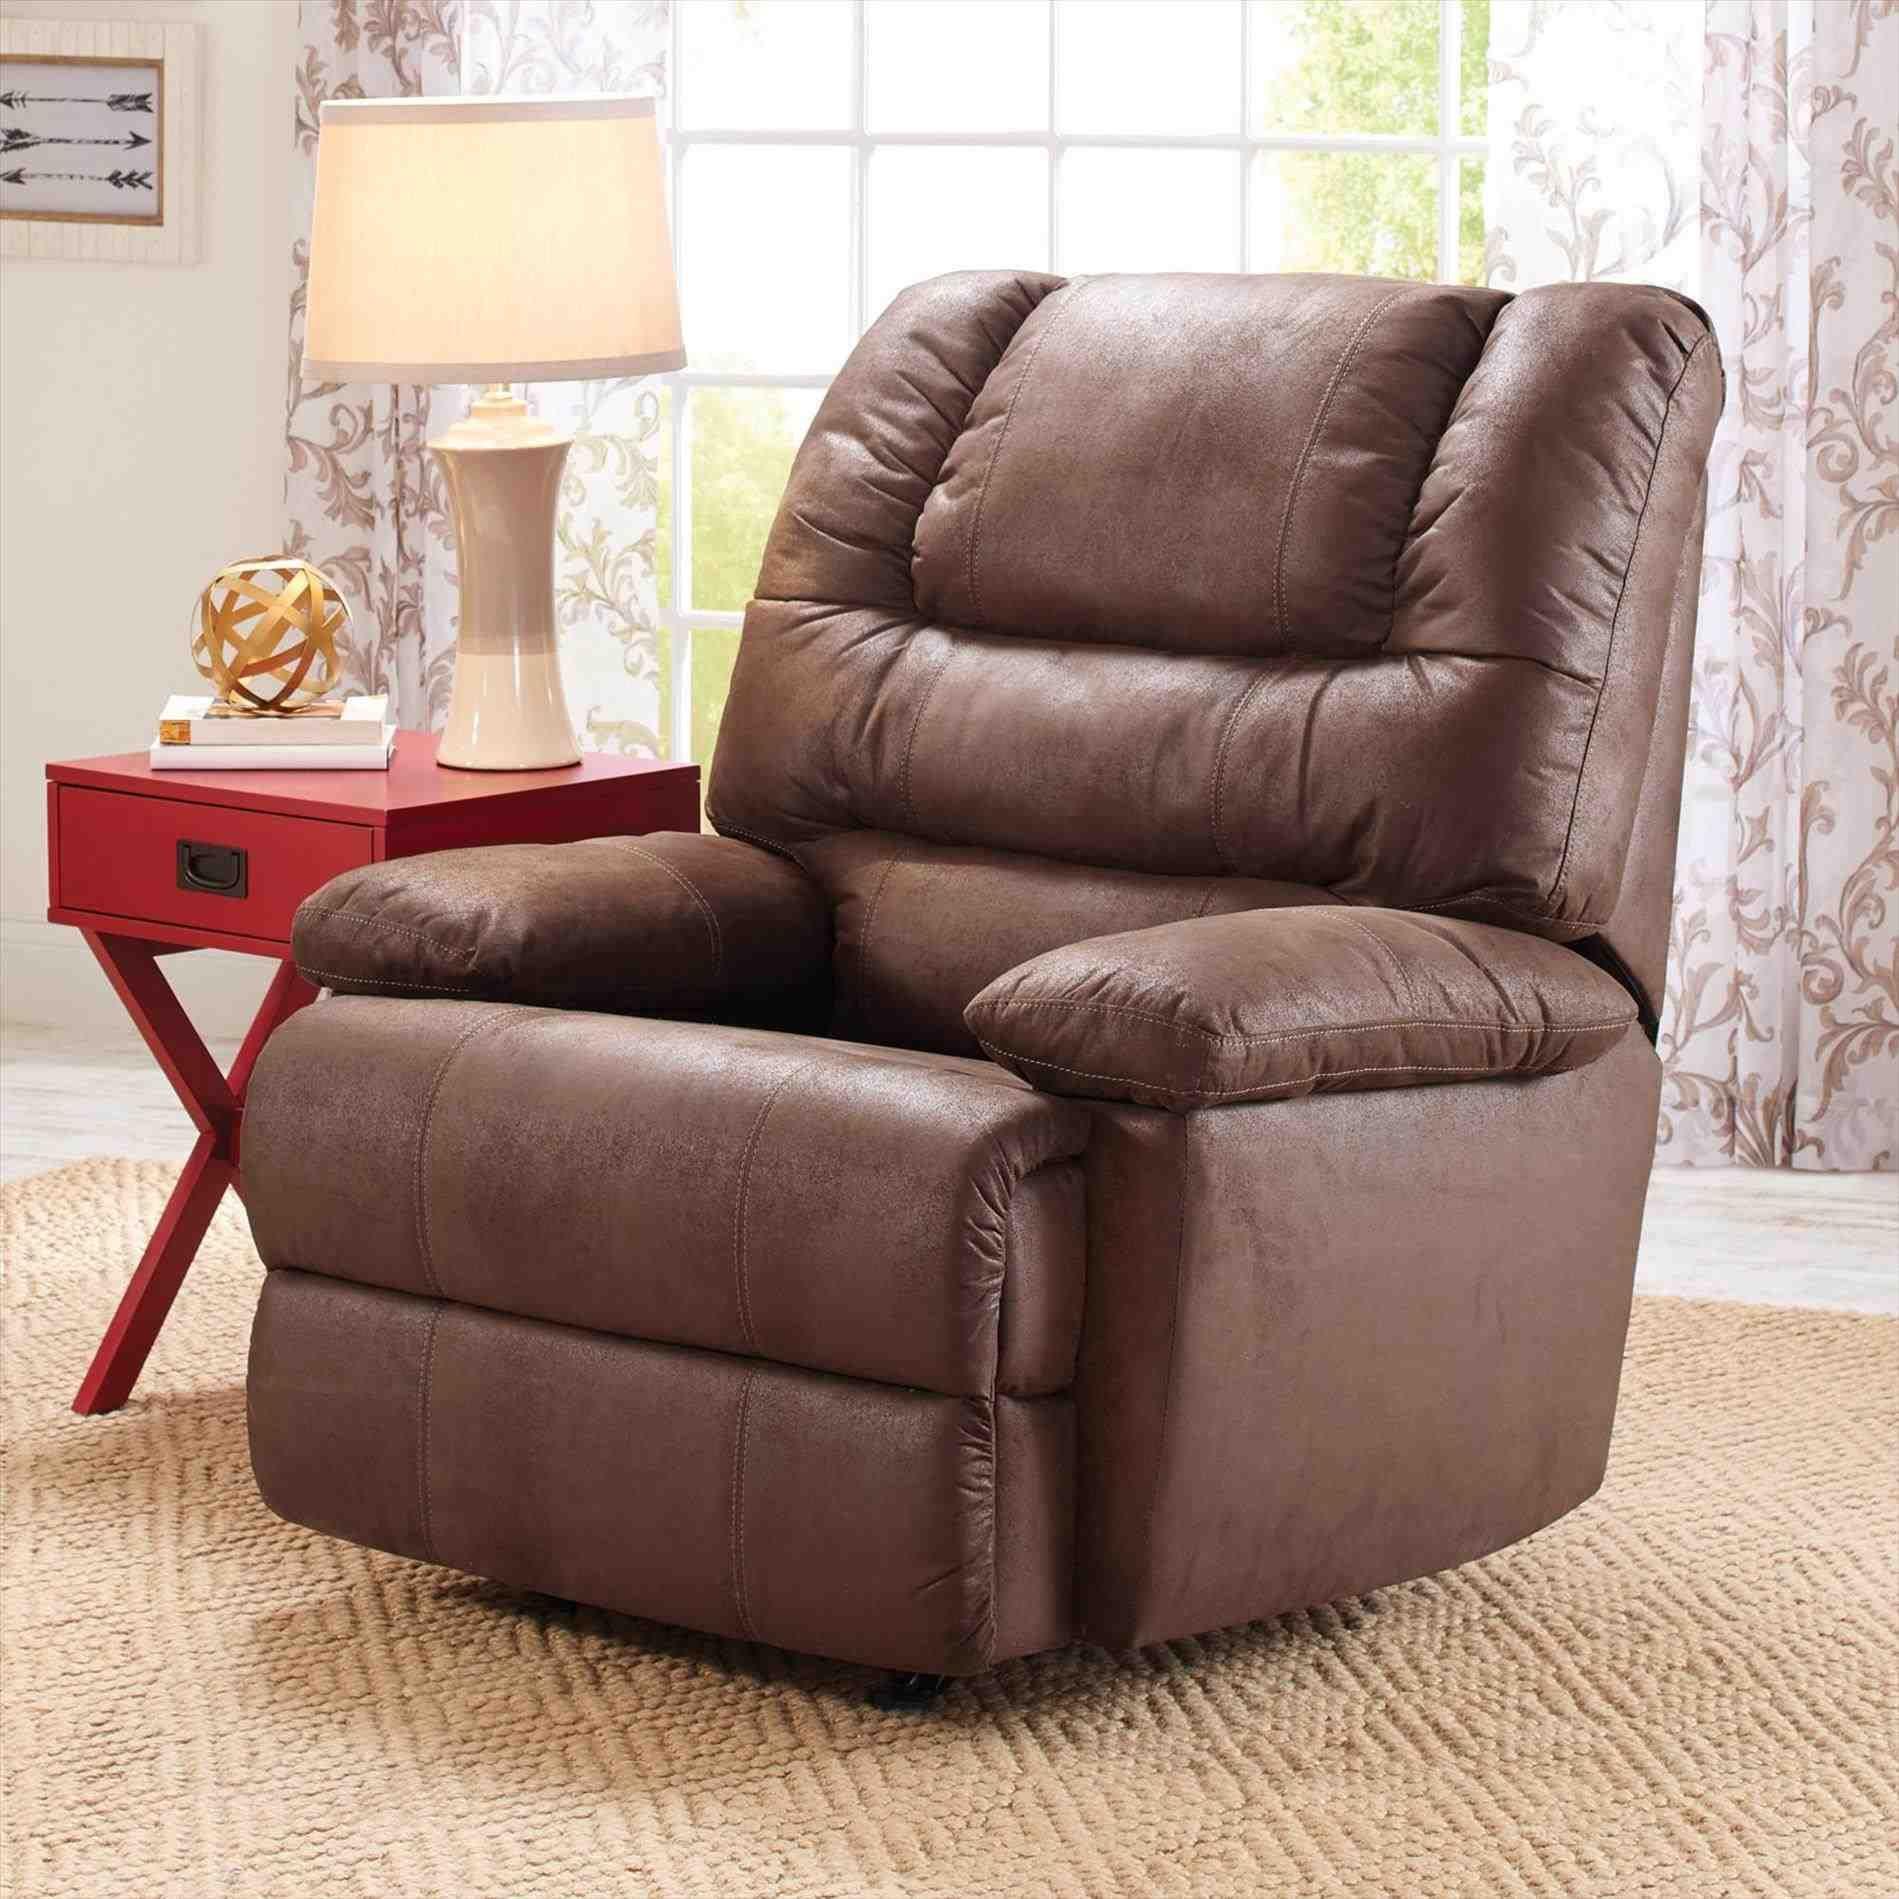 Enjoyable Cheap Living Room Furniture Memphis Tn Affordable Download Free Architecture Designs Scobabritishbridgeorg